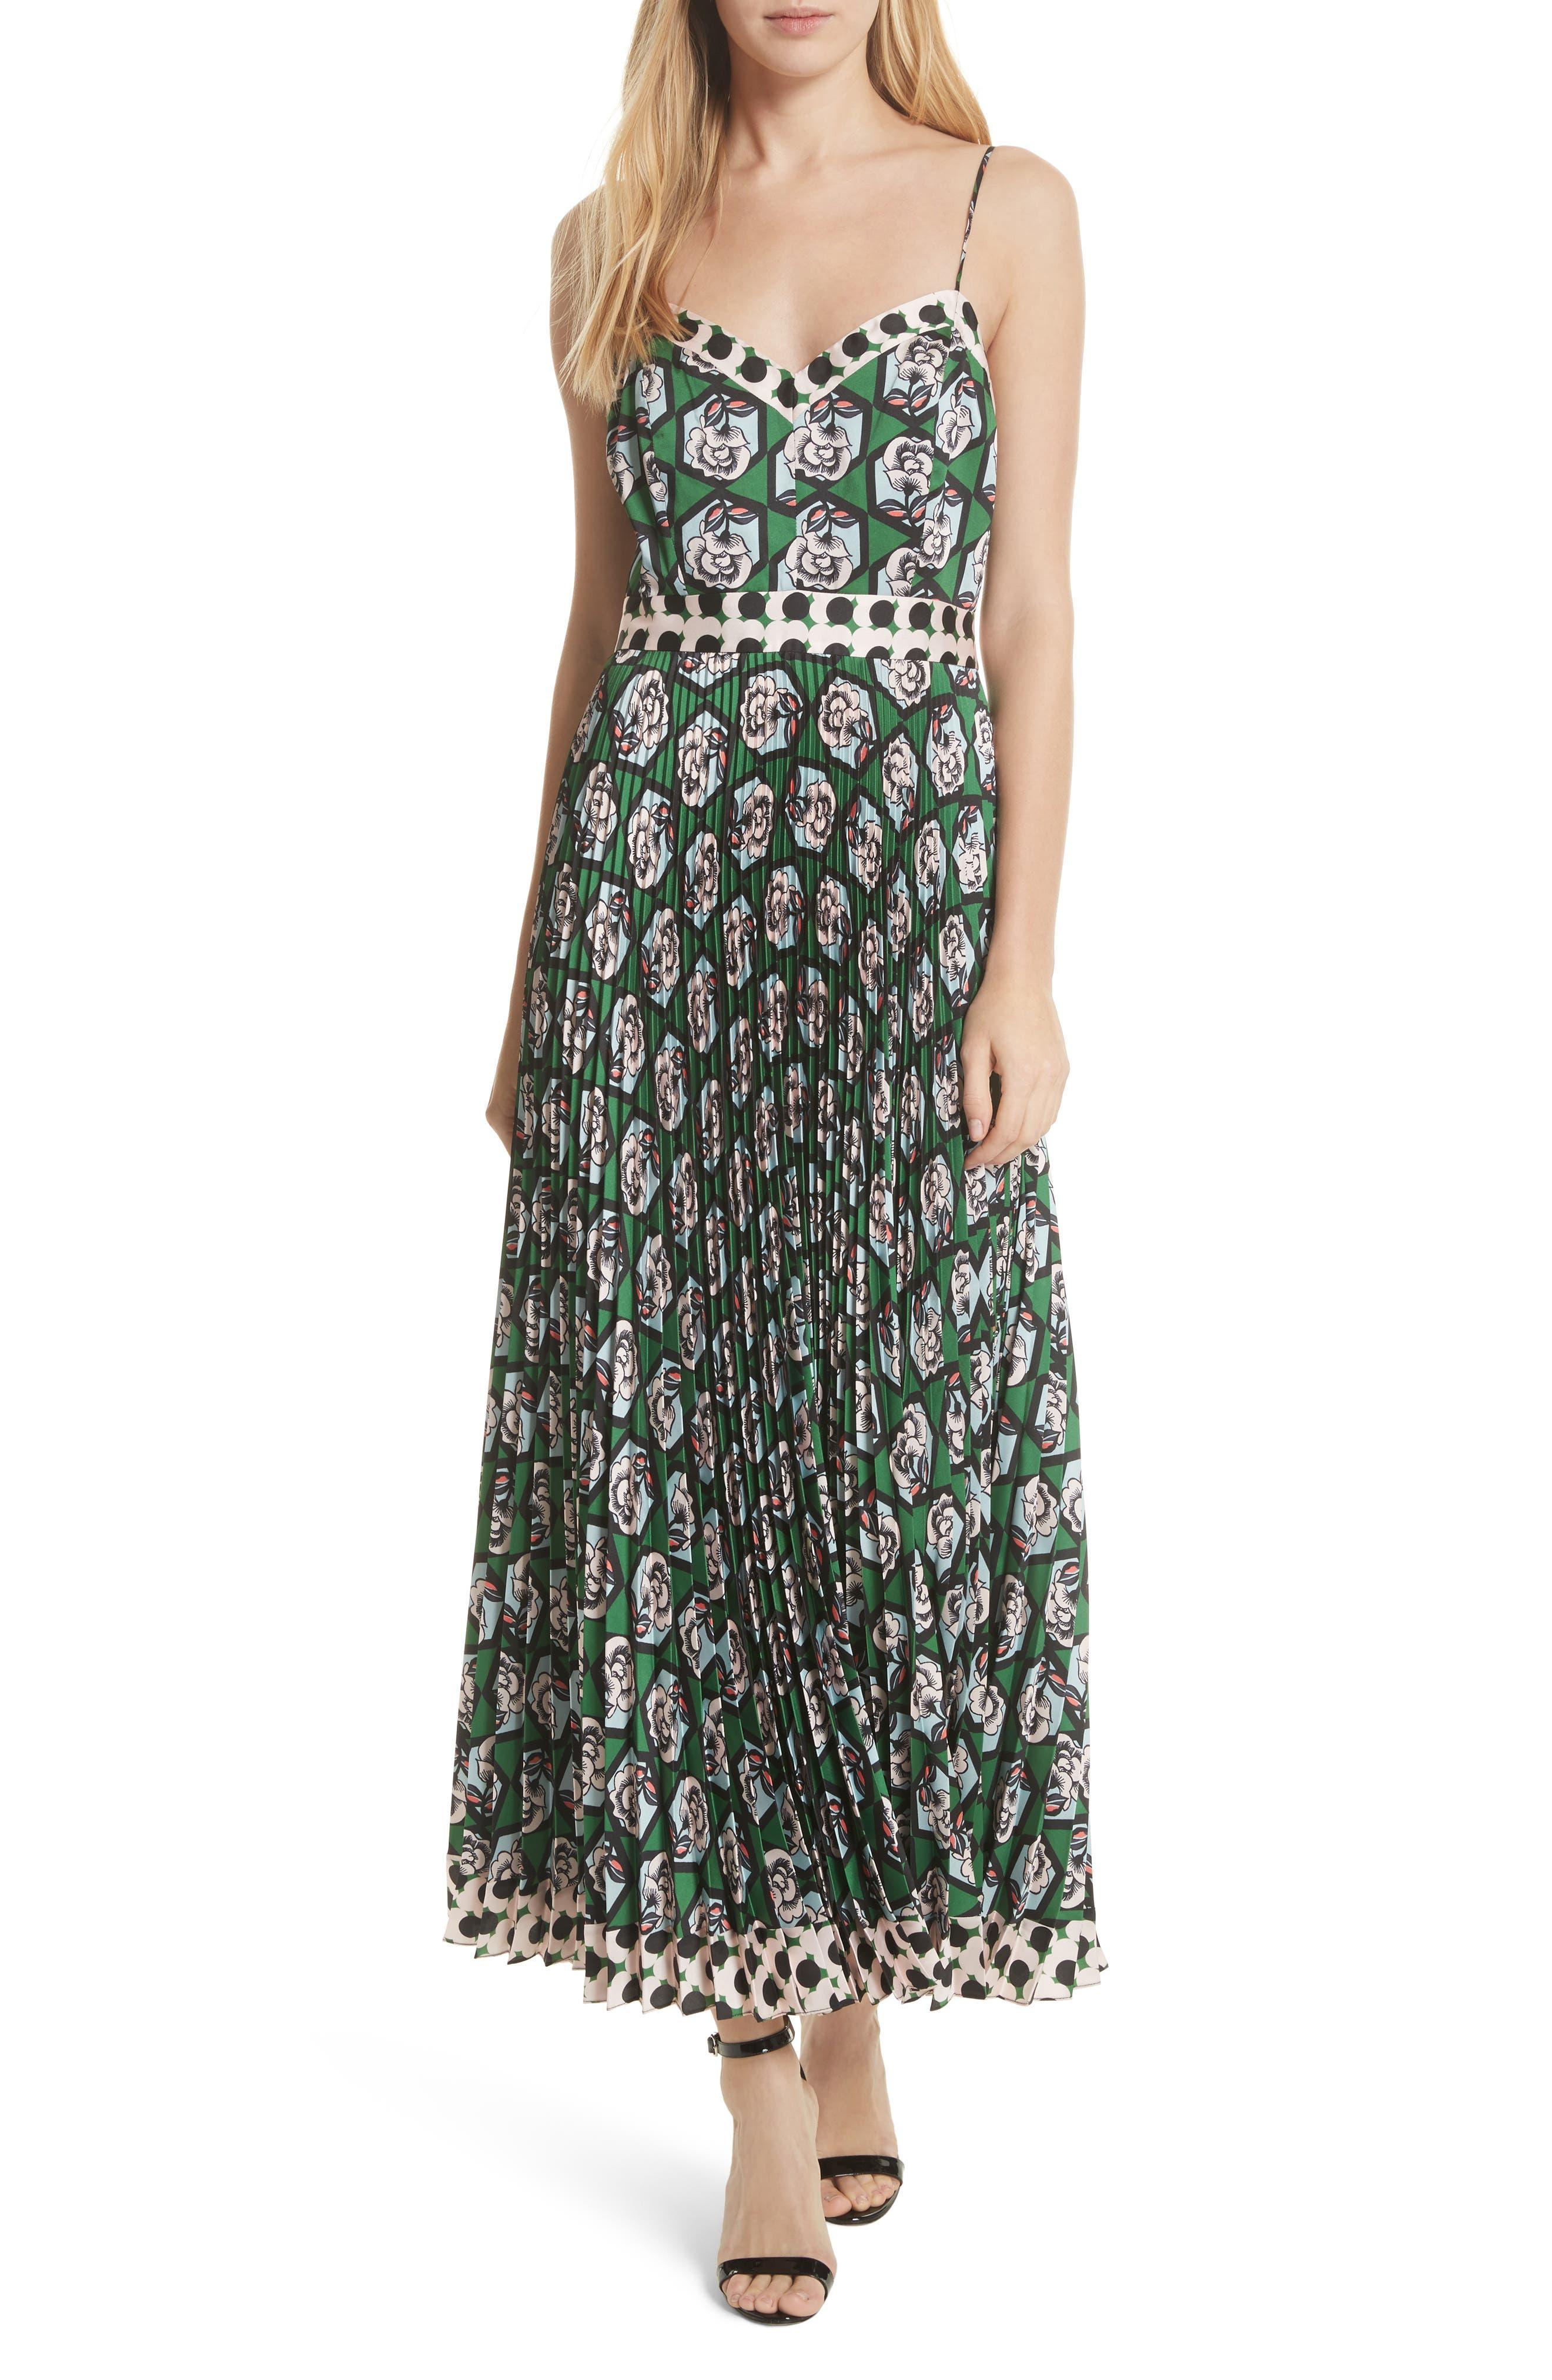 Milly Jill Hexagon Floral Print Maxi Dress